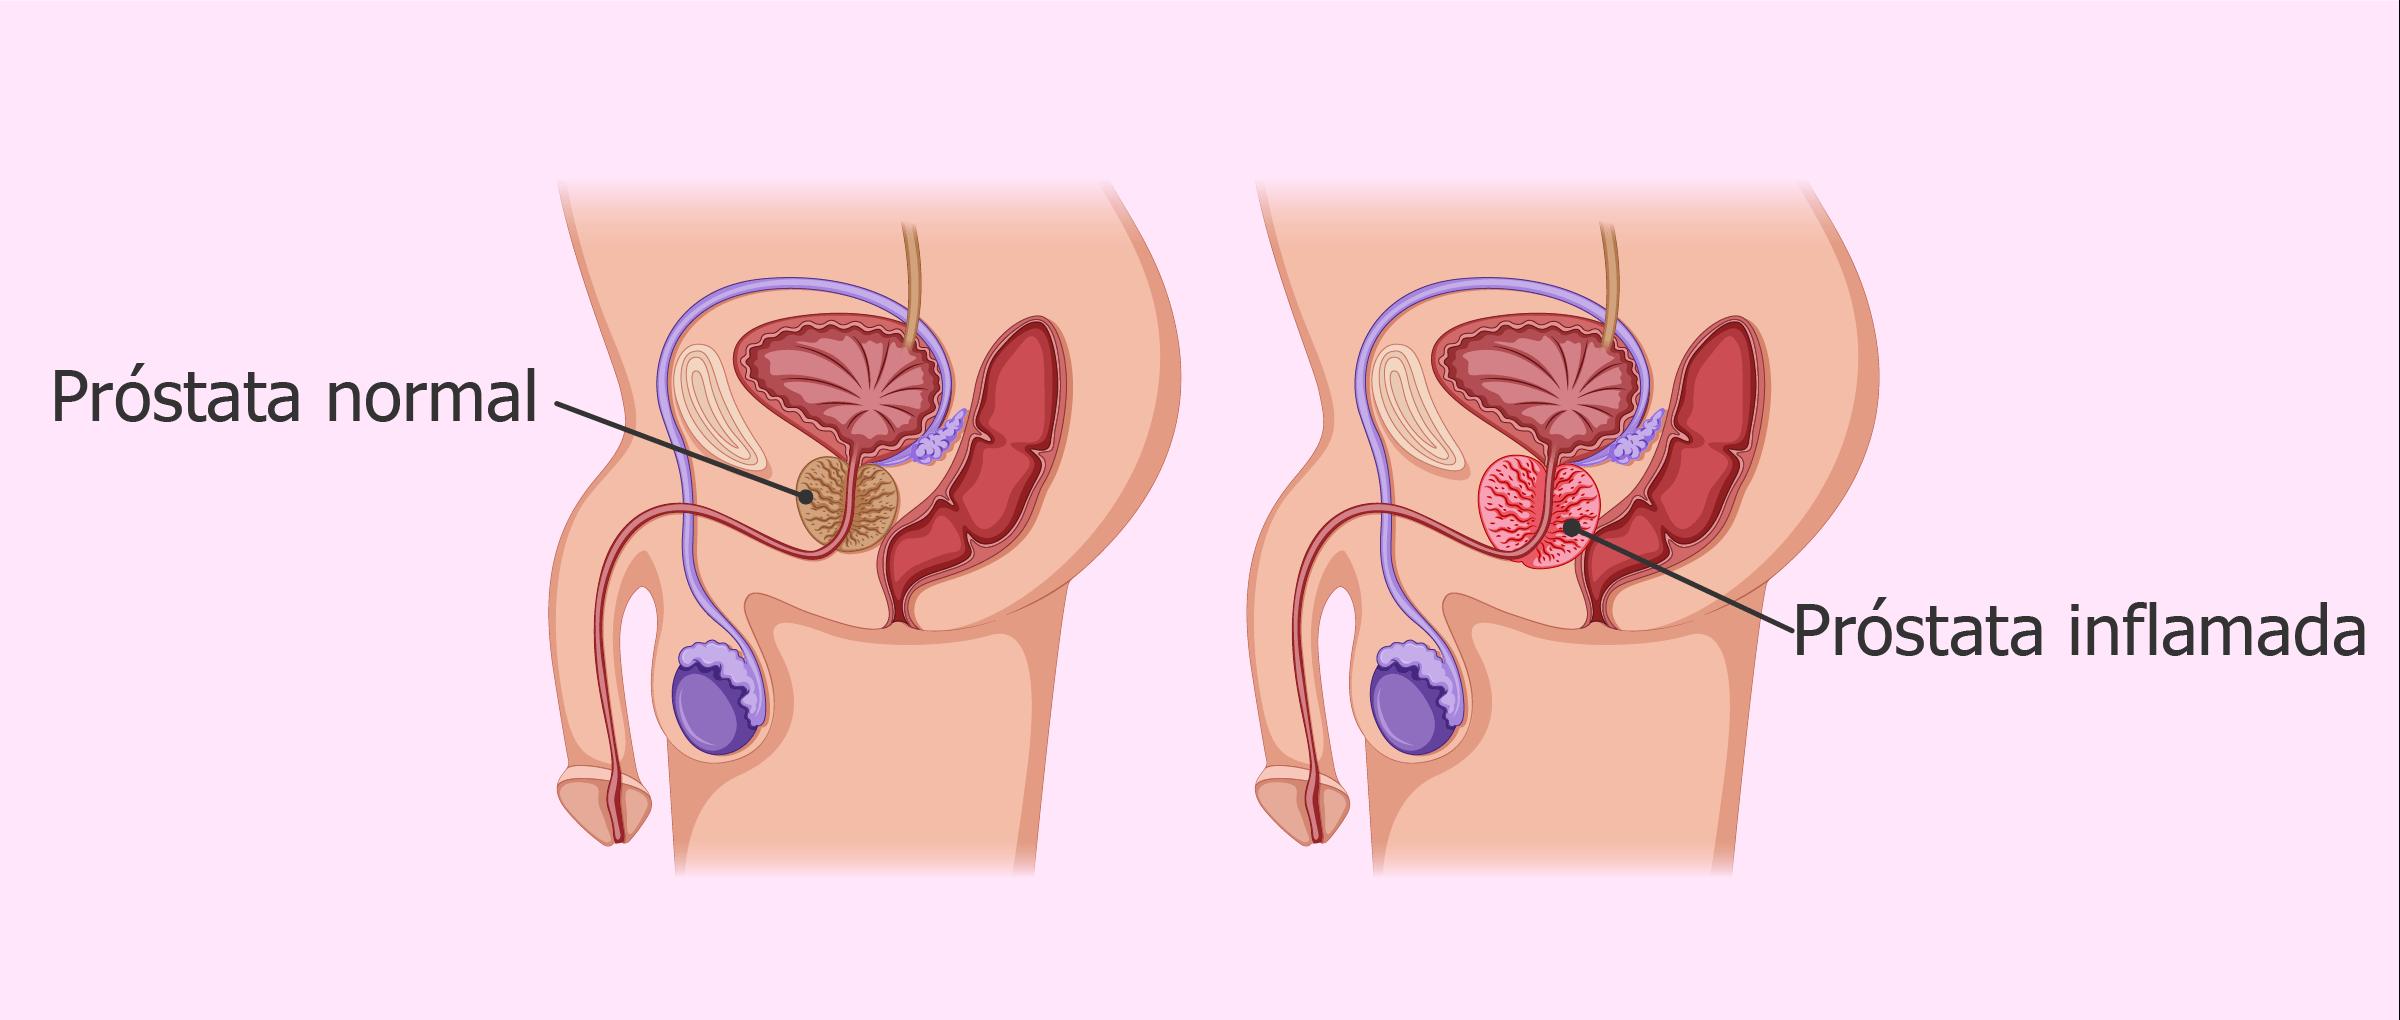 tratamientos para la prostatitis aguda